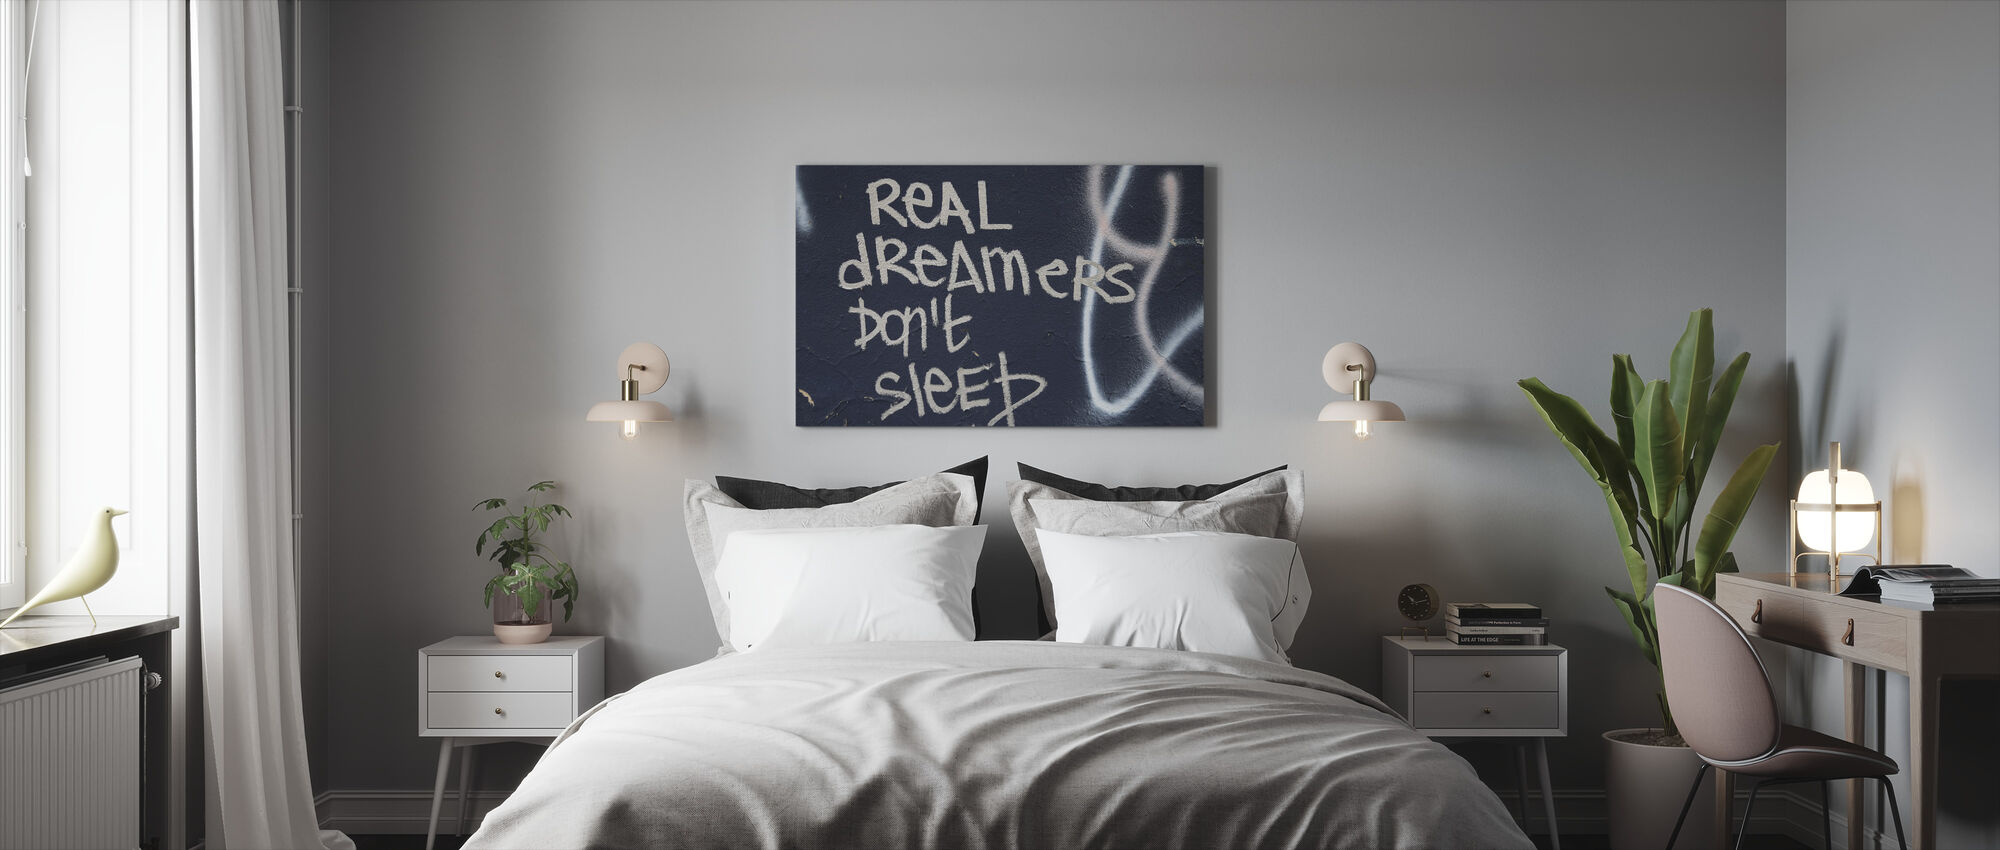 Julkisivu graffiti - Canvastaulu - Makuuhuone